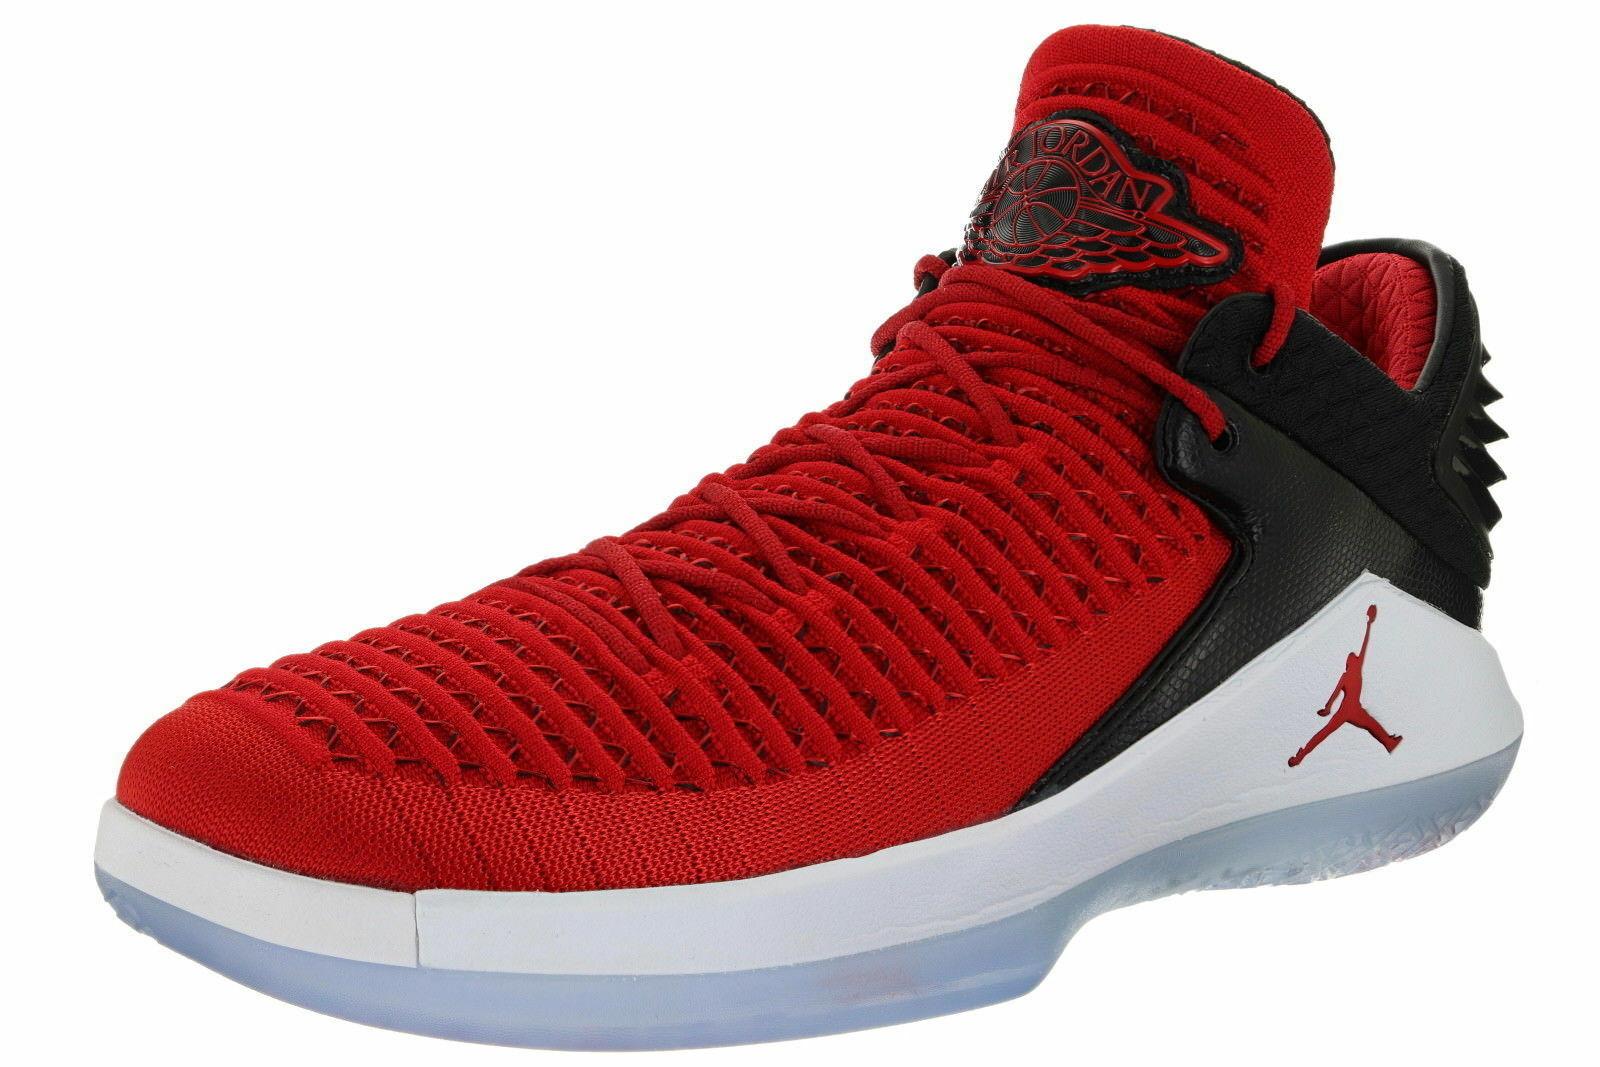 top quality los angeles fantastic savings Nike Air Jordan Shoes: 18 customer reviews and 111 listings